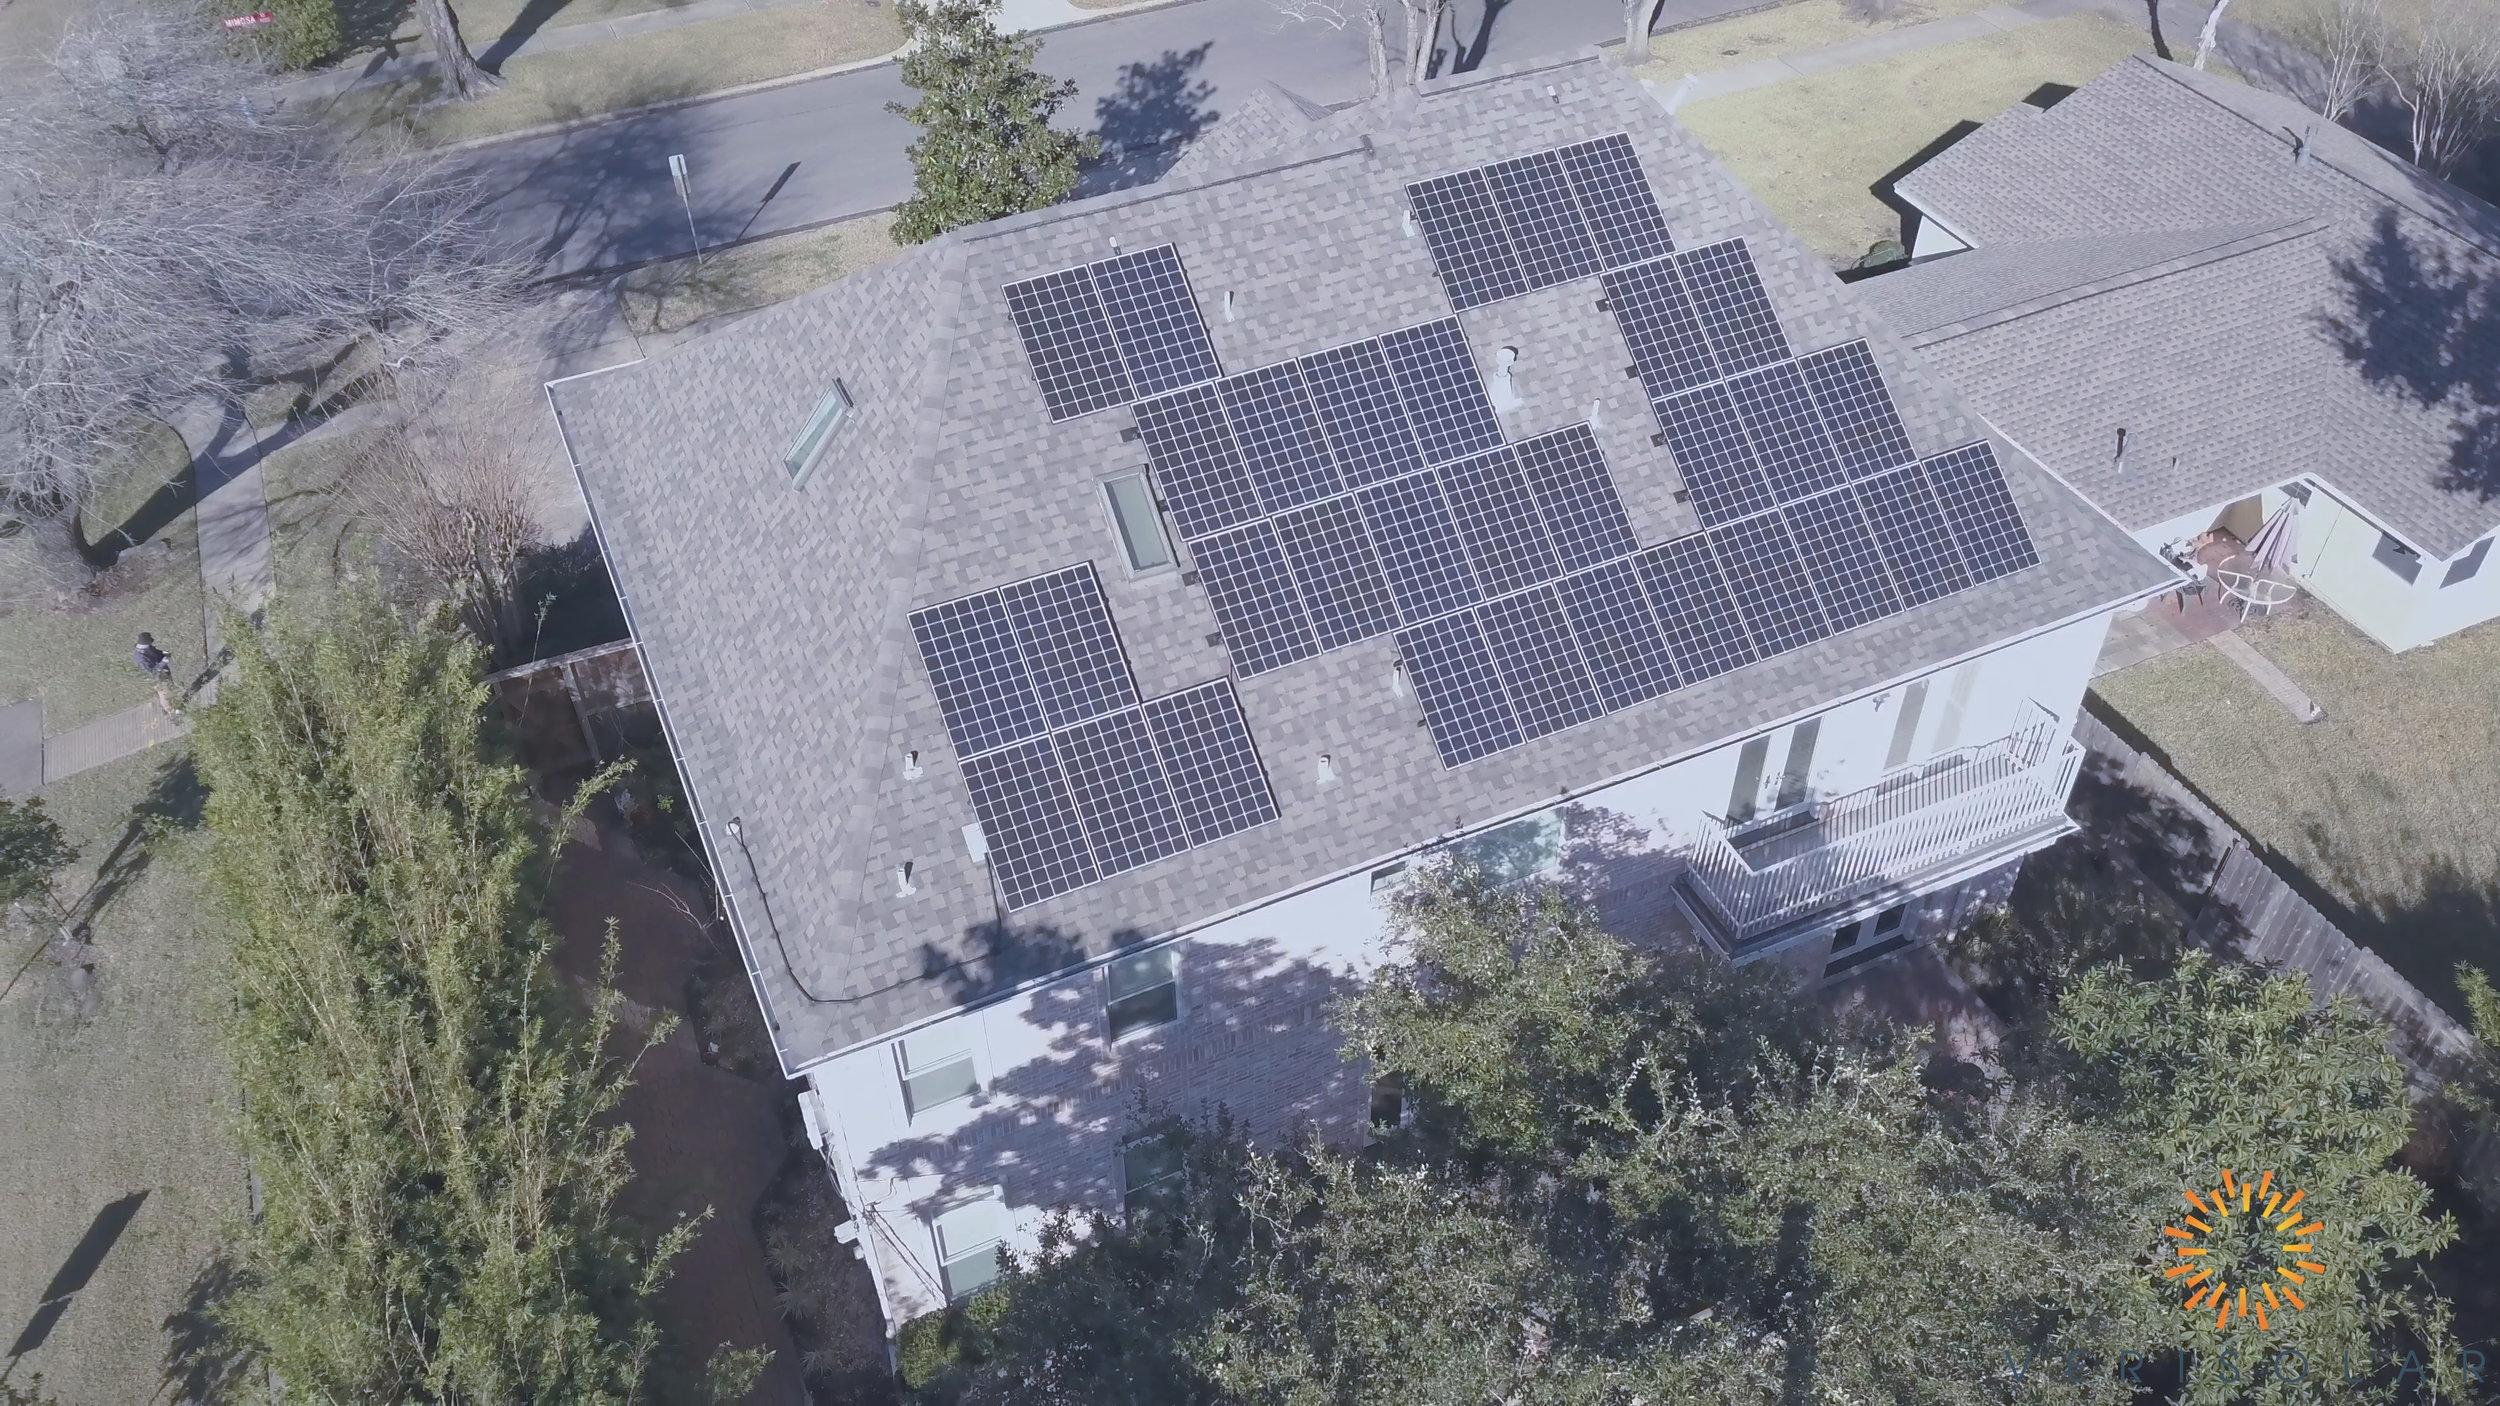 BELLAIRE, TX - 10.8 kW